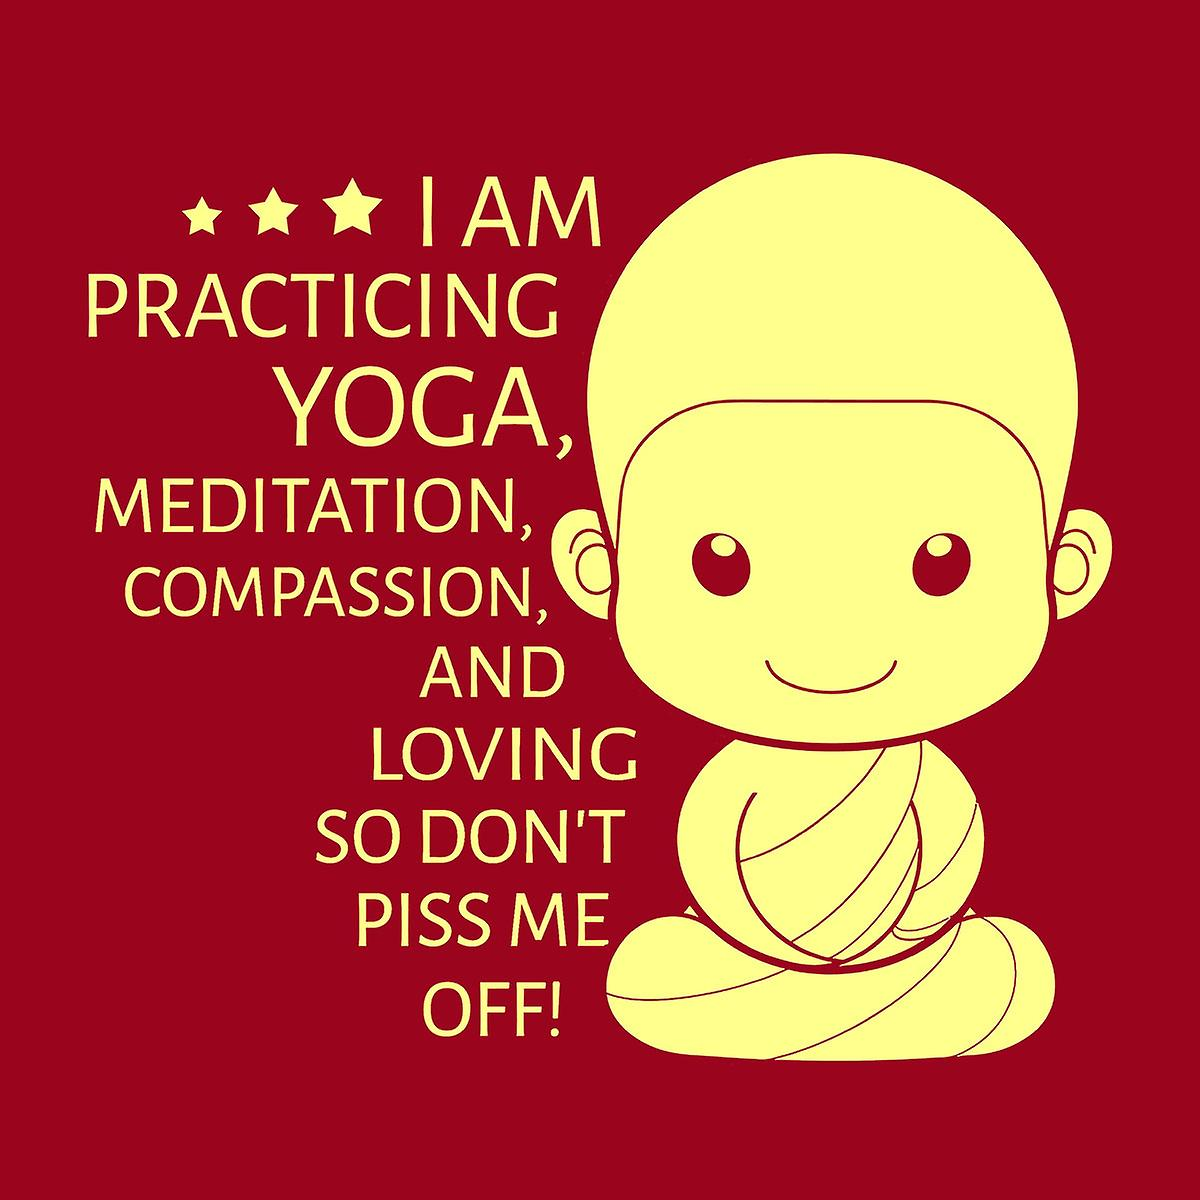 Yoga Dont Piss Me Off Women's T-Shirt | Fruugo